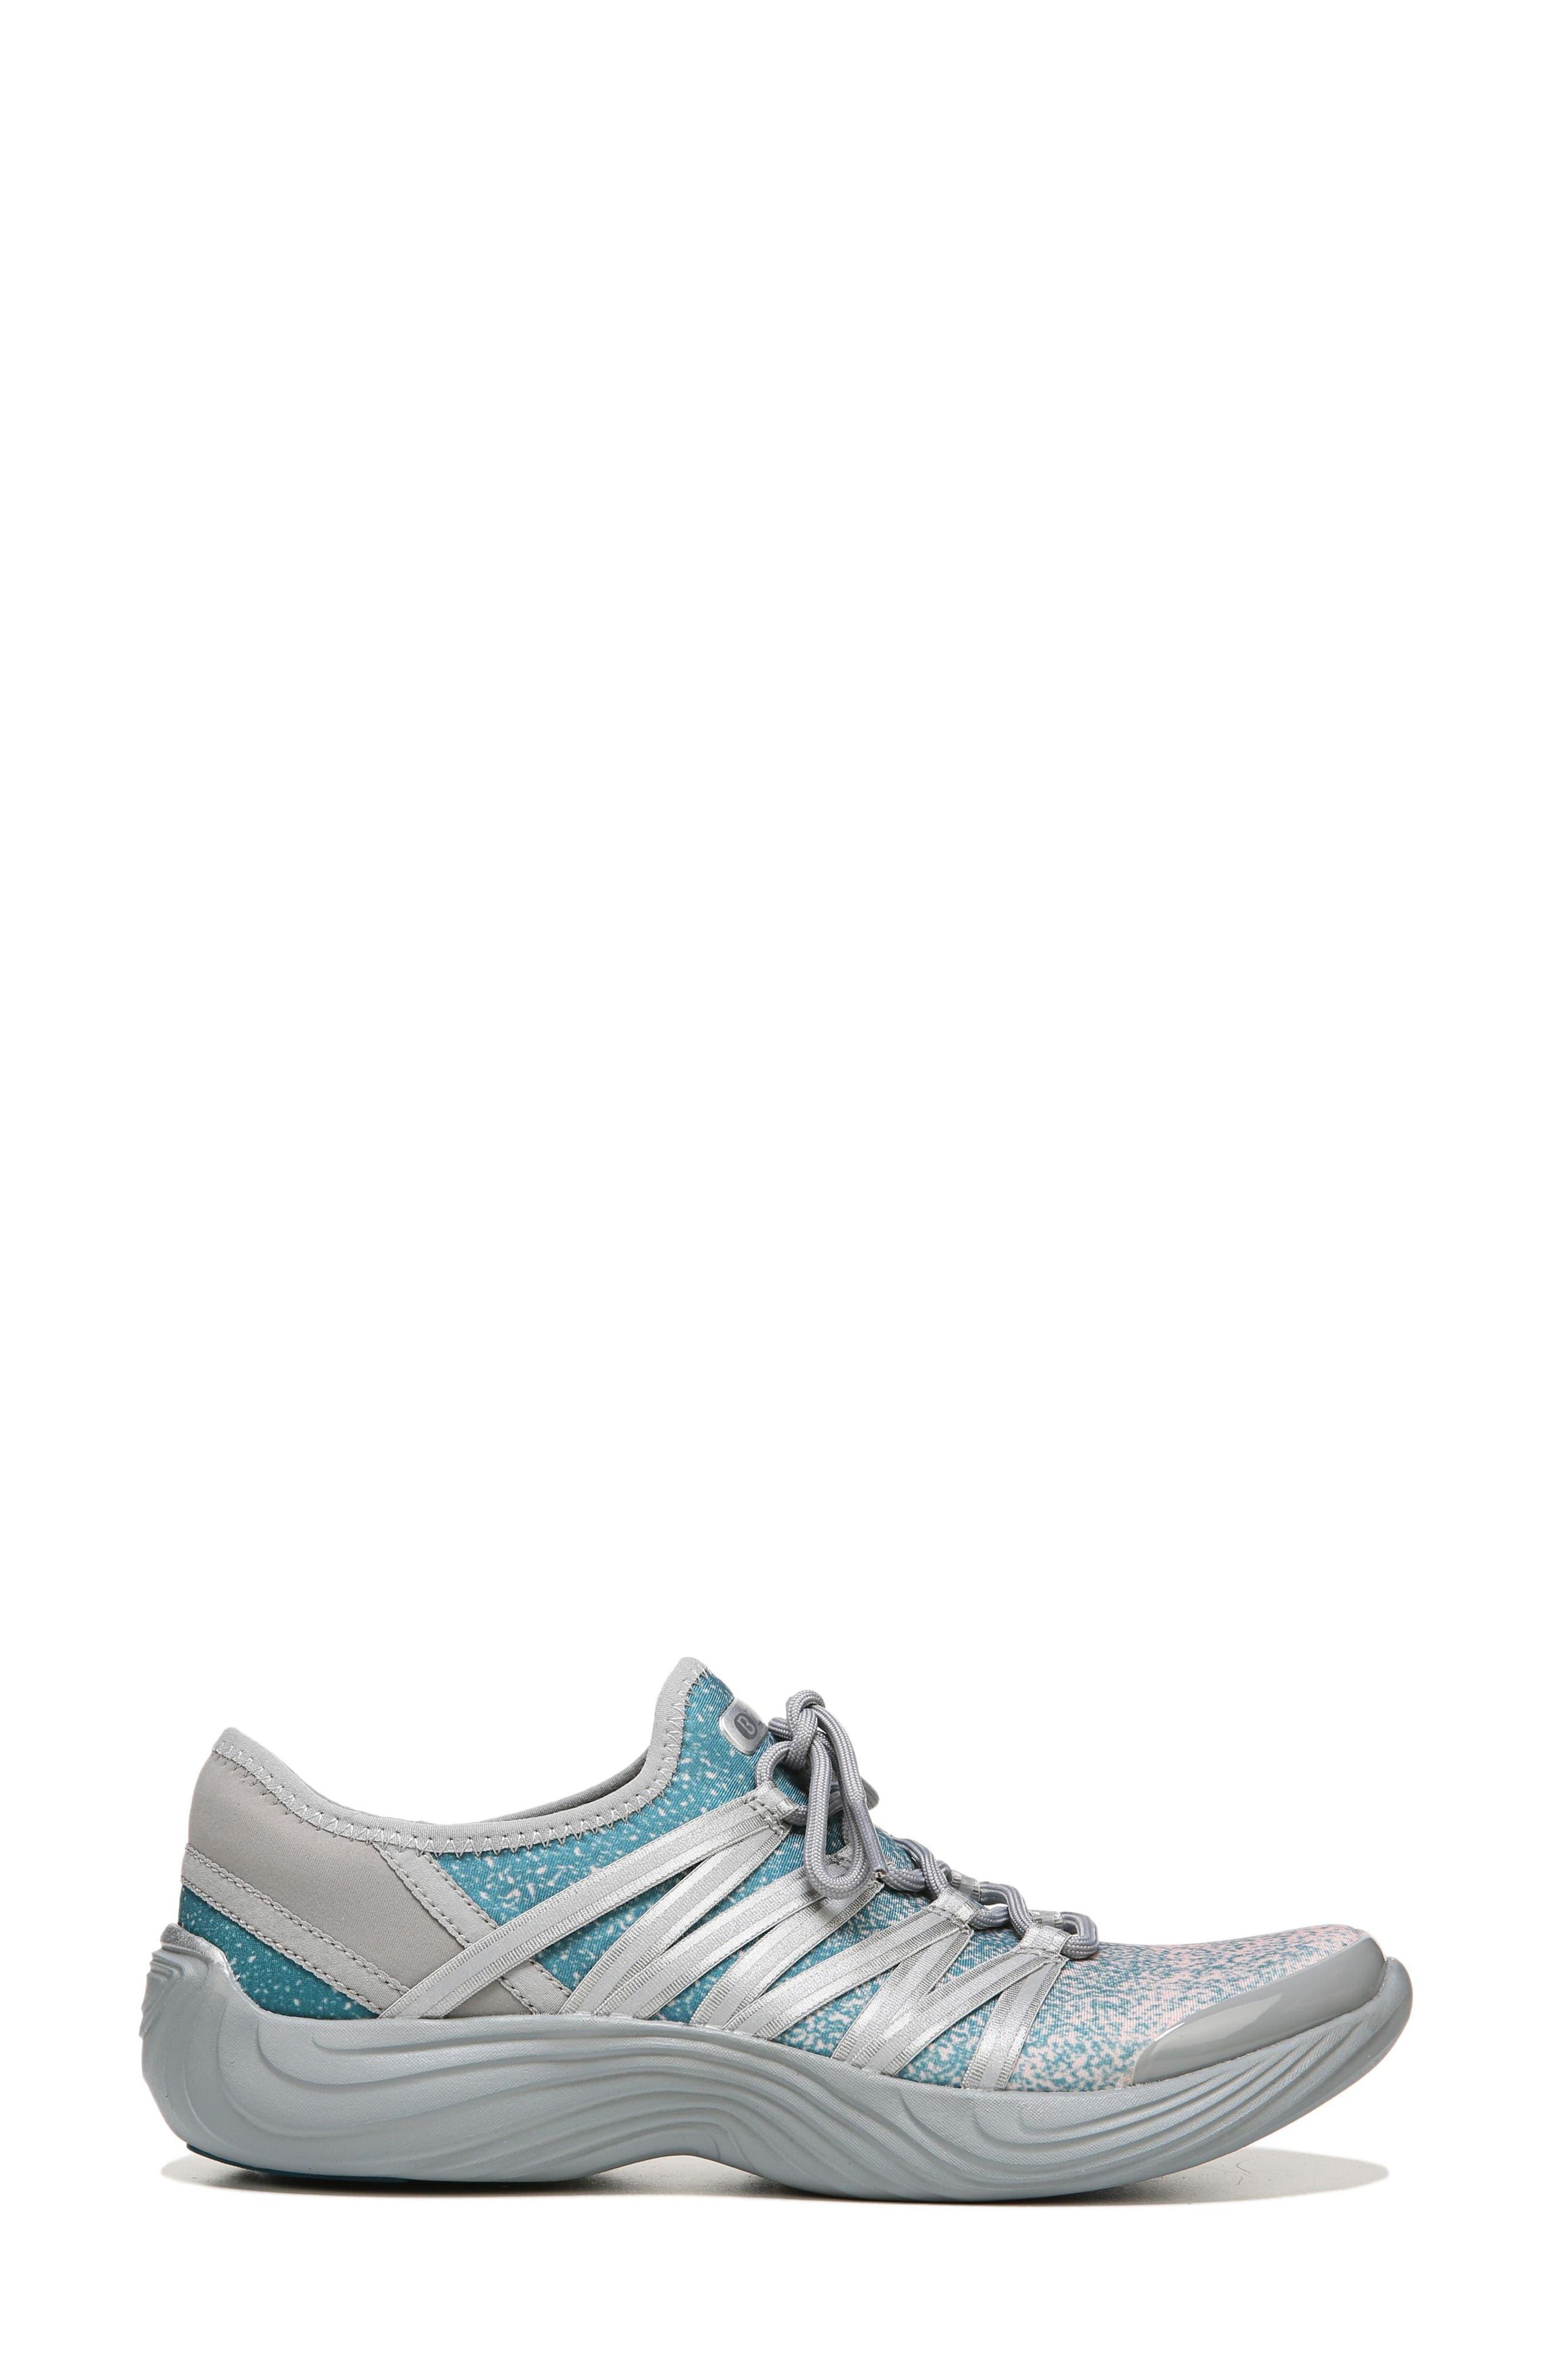 Tender Sneaker,                             Alternate thumbnail 3, color,                             Pink Fabric